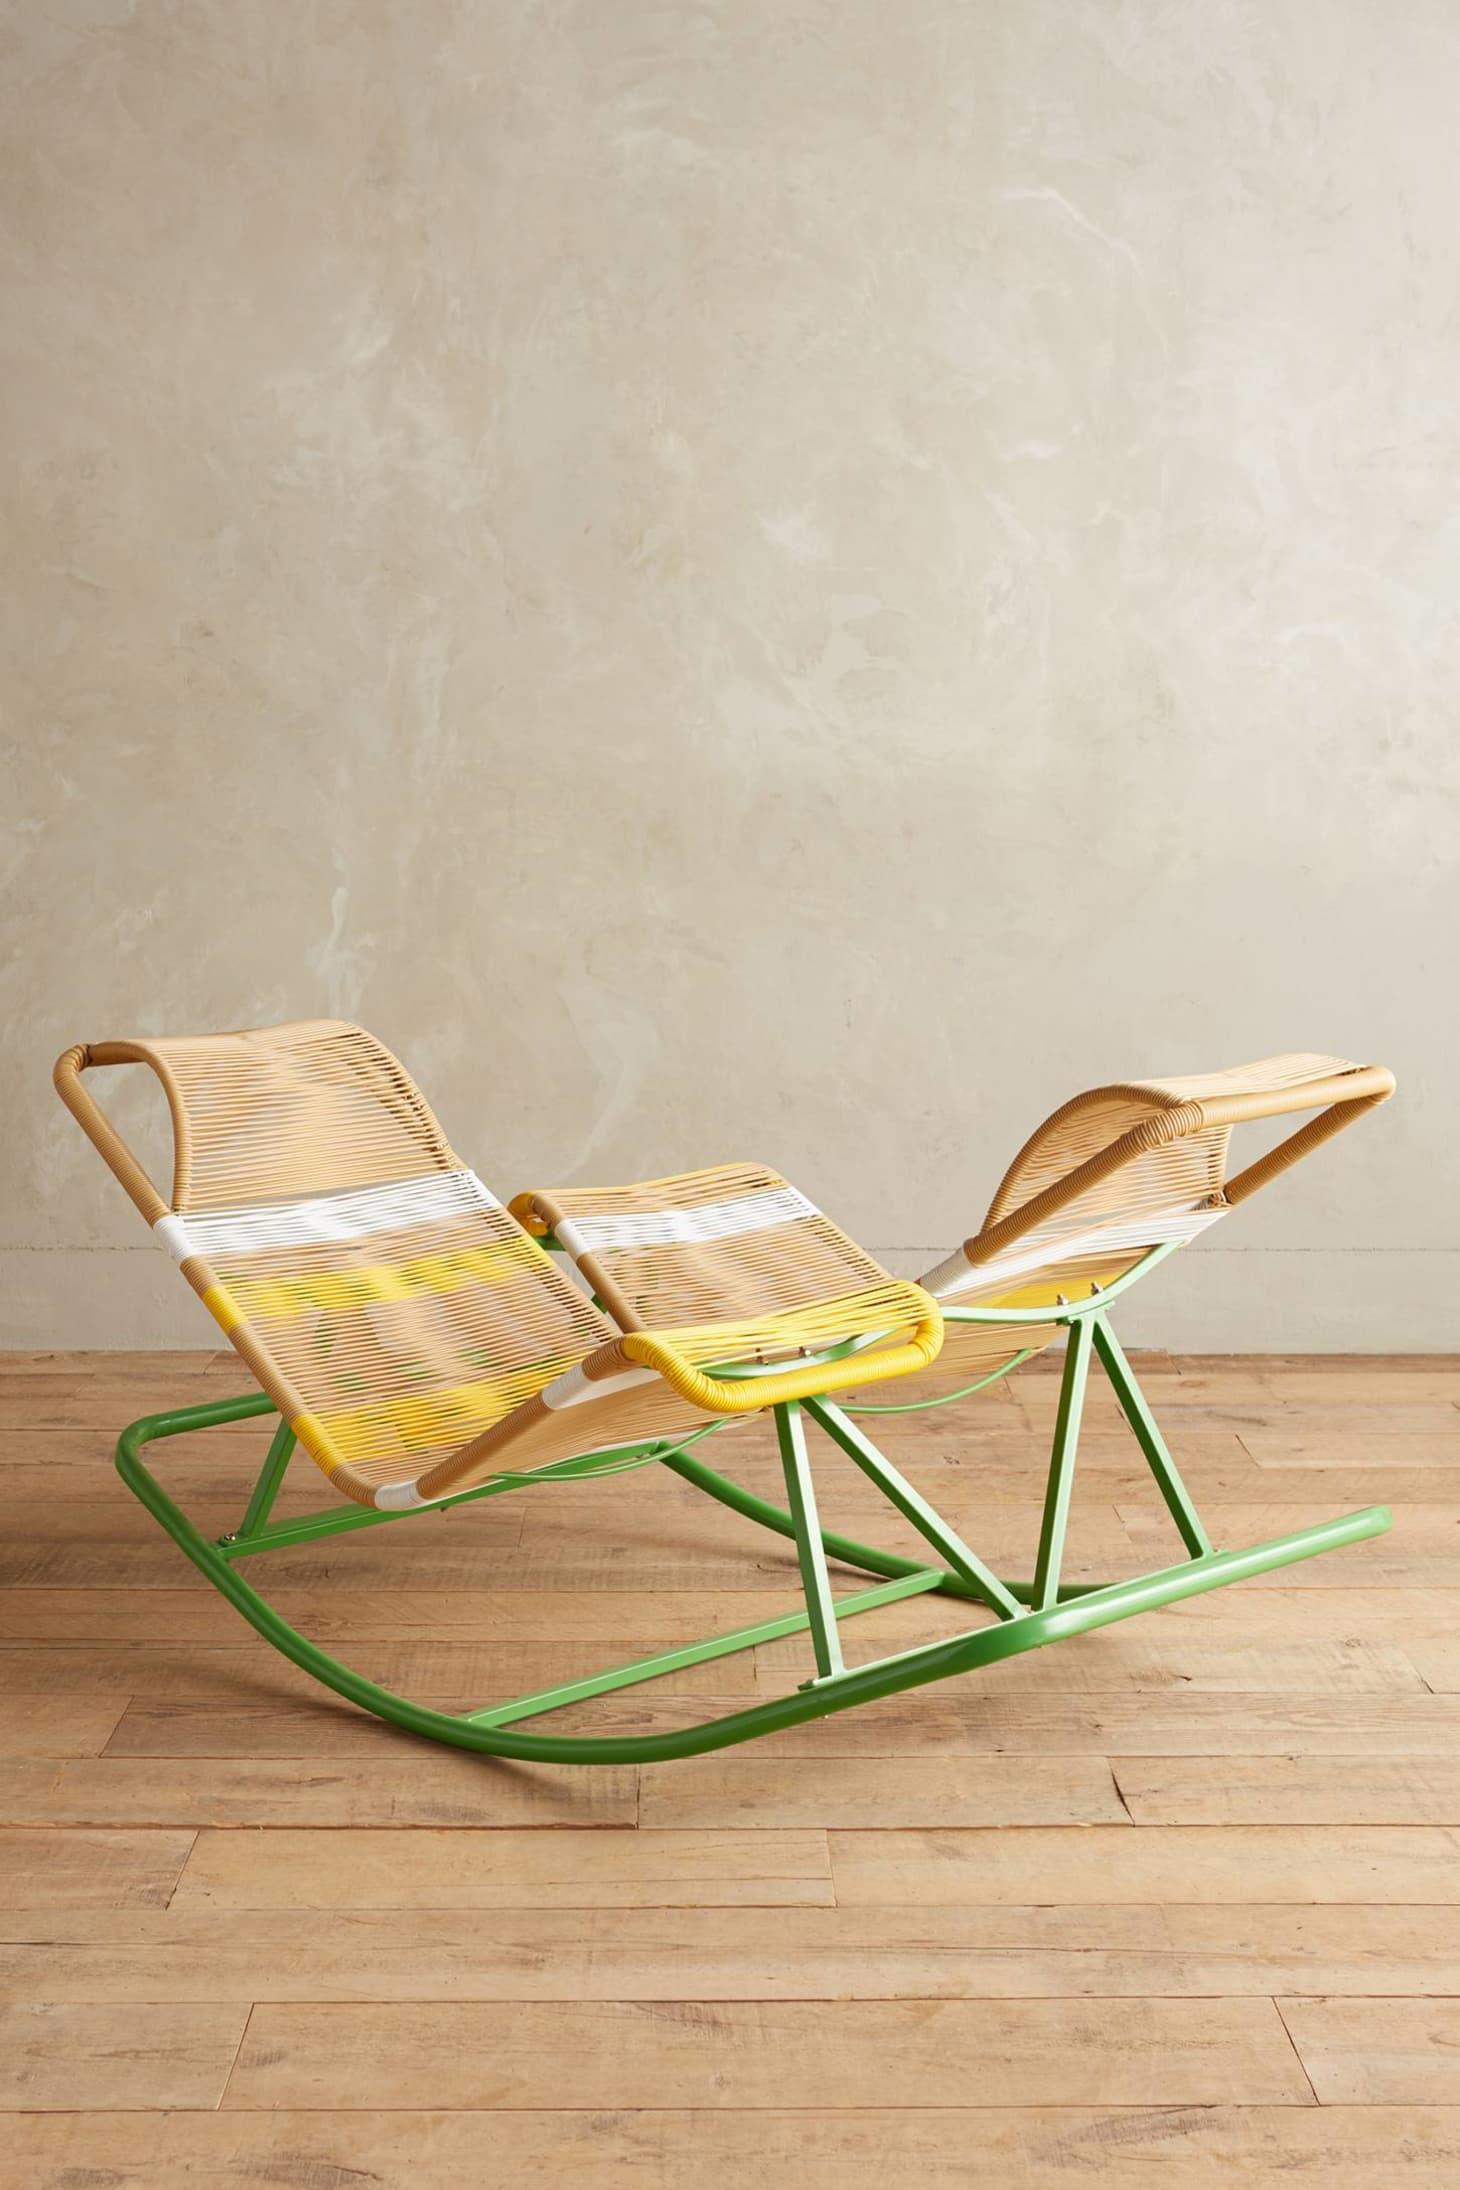 Enjoyable The Rocking Chair For Social Loungers Kitchn Short Links Chair Design For Home Short Linksinfo